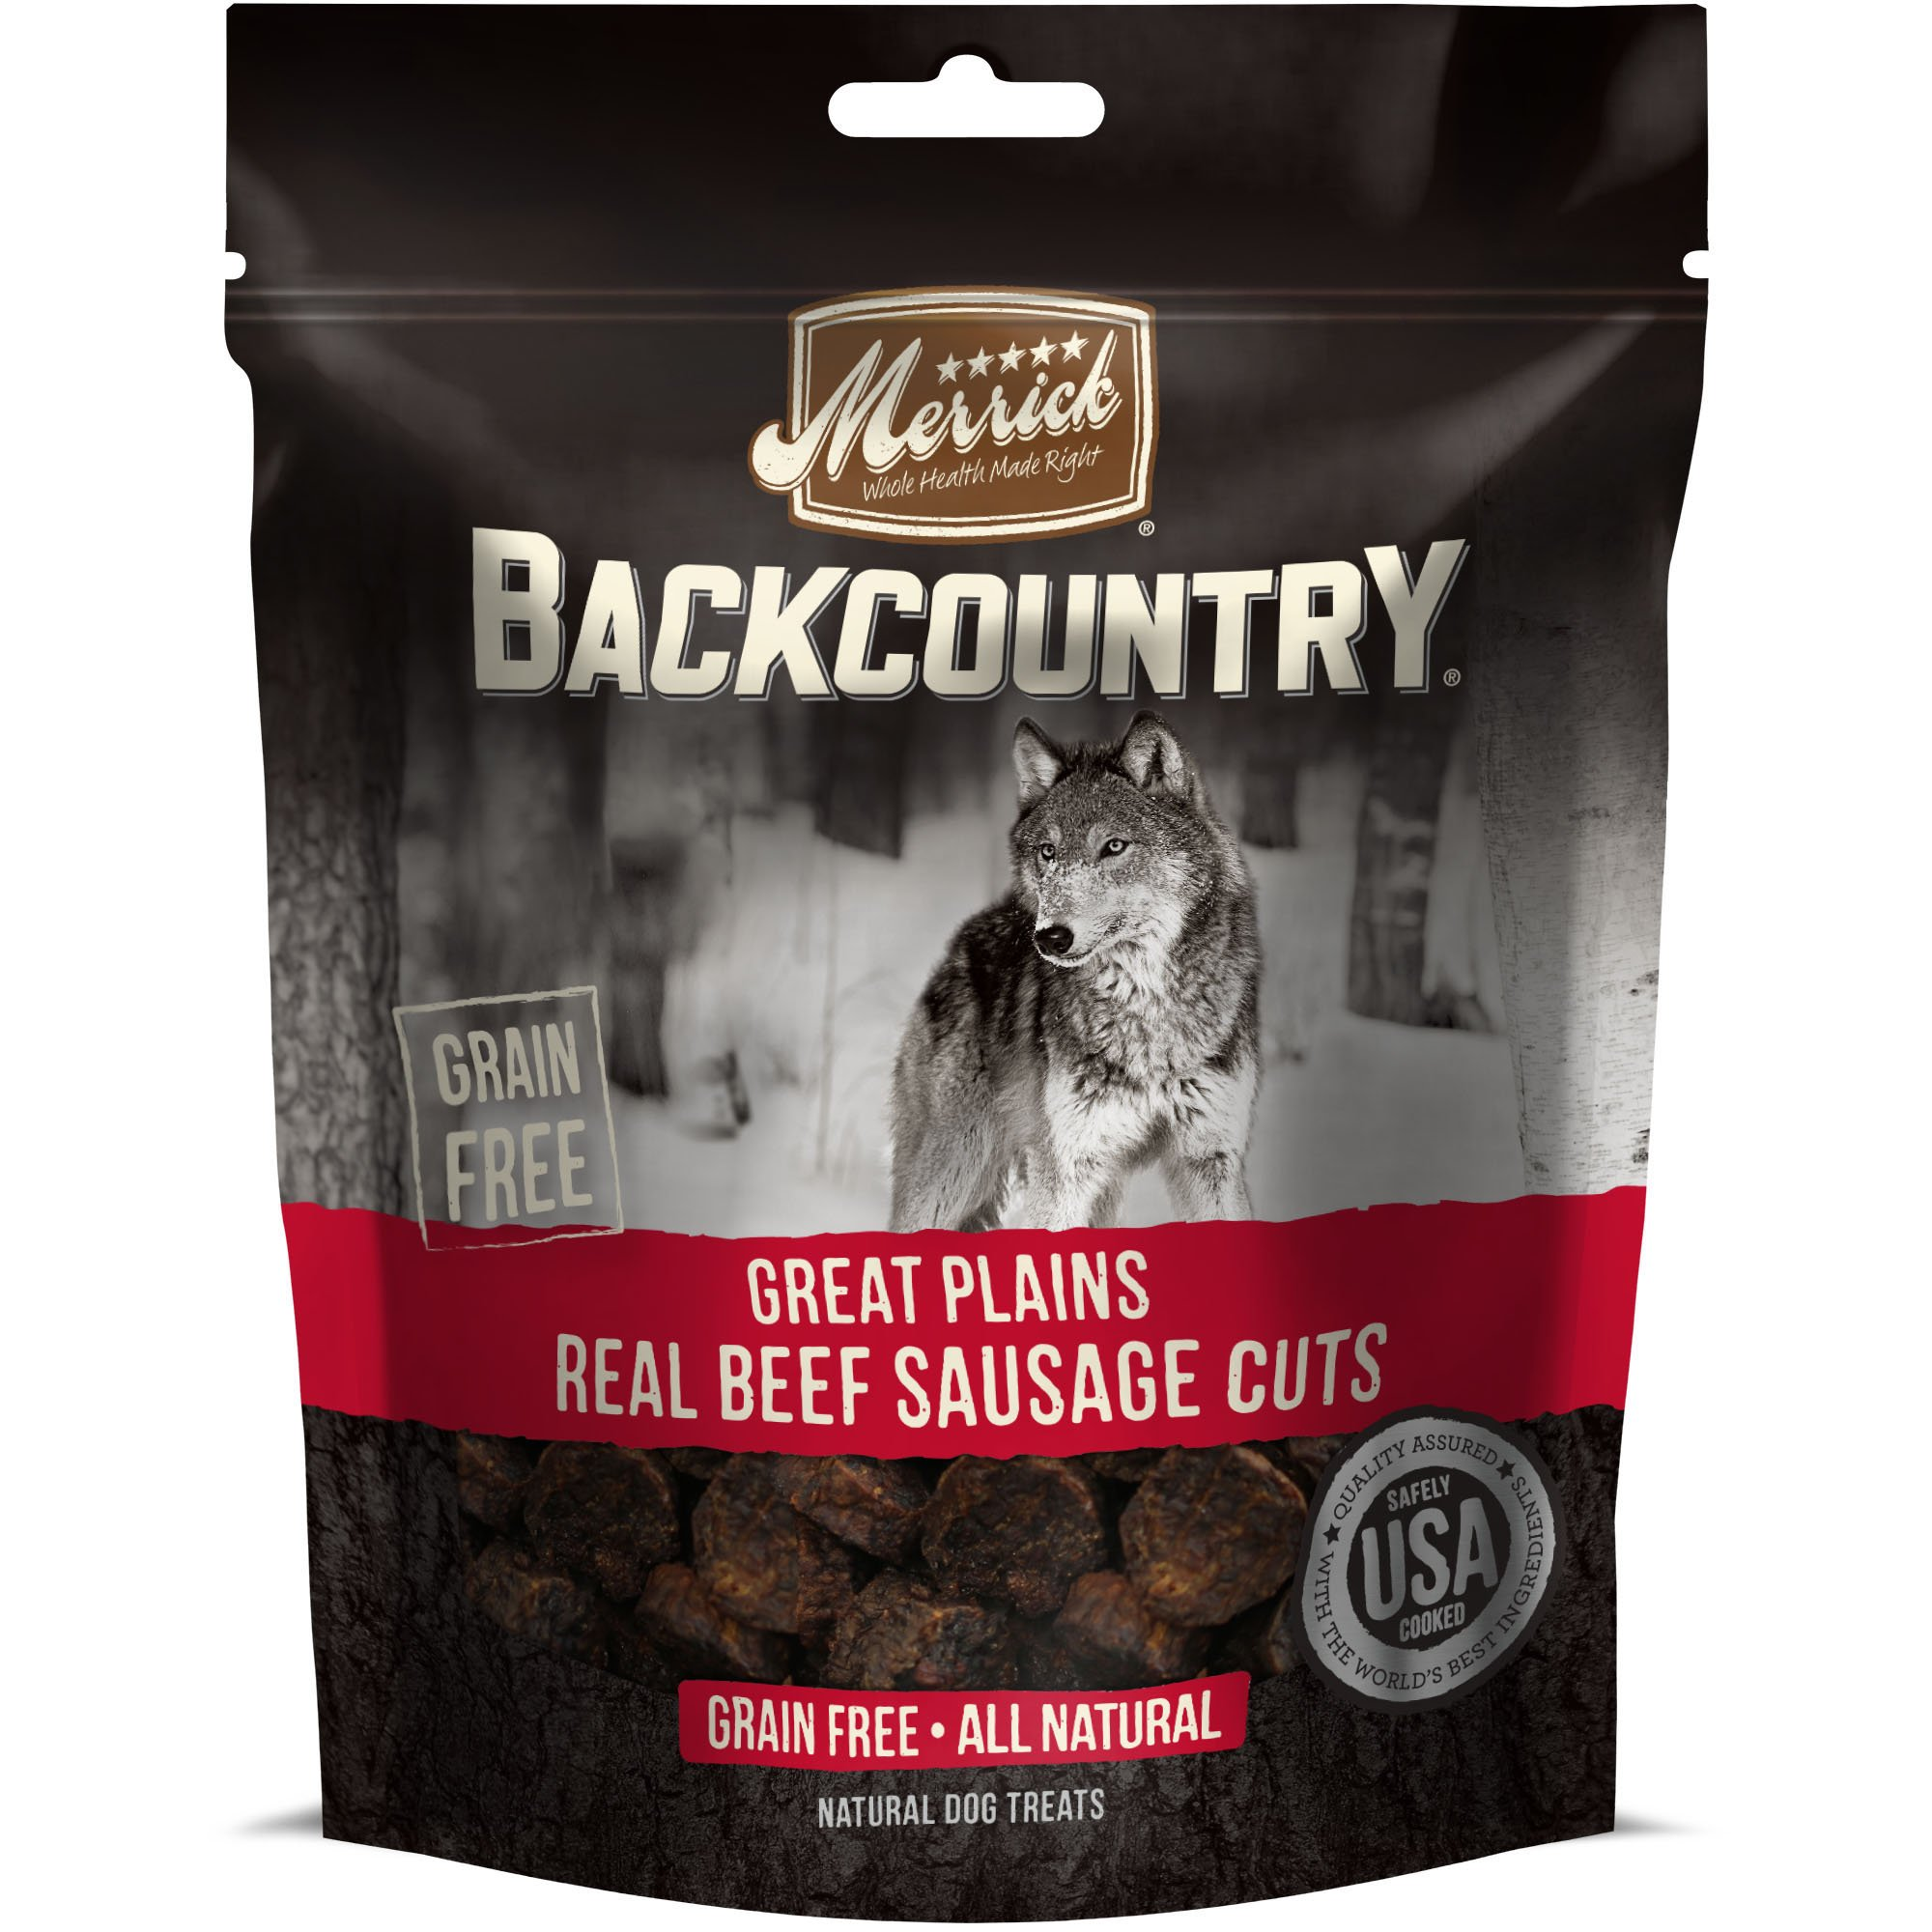 Merrick Backcountry Grain Free Beef Sausage Cuts Dog Treats